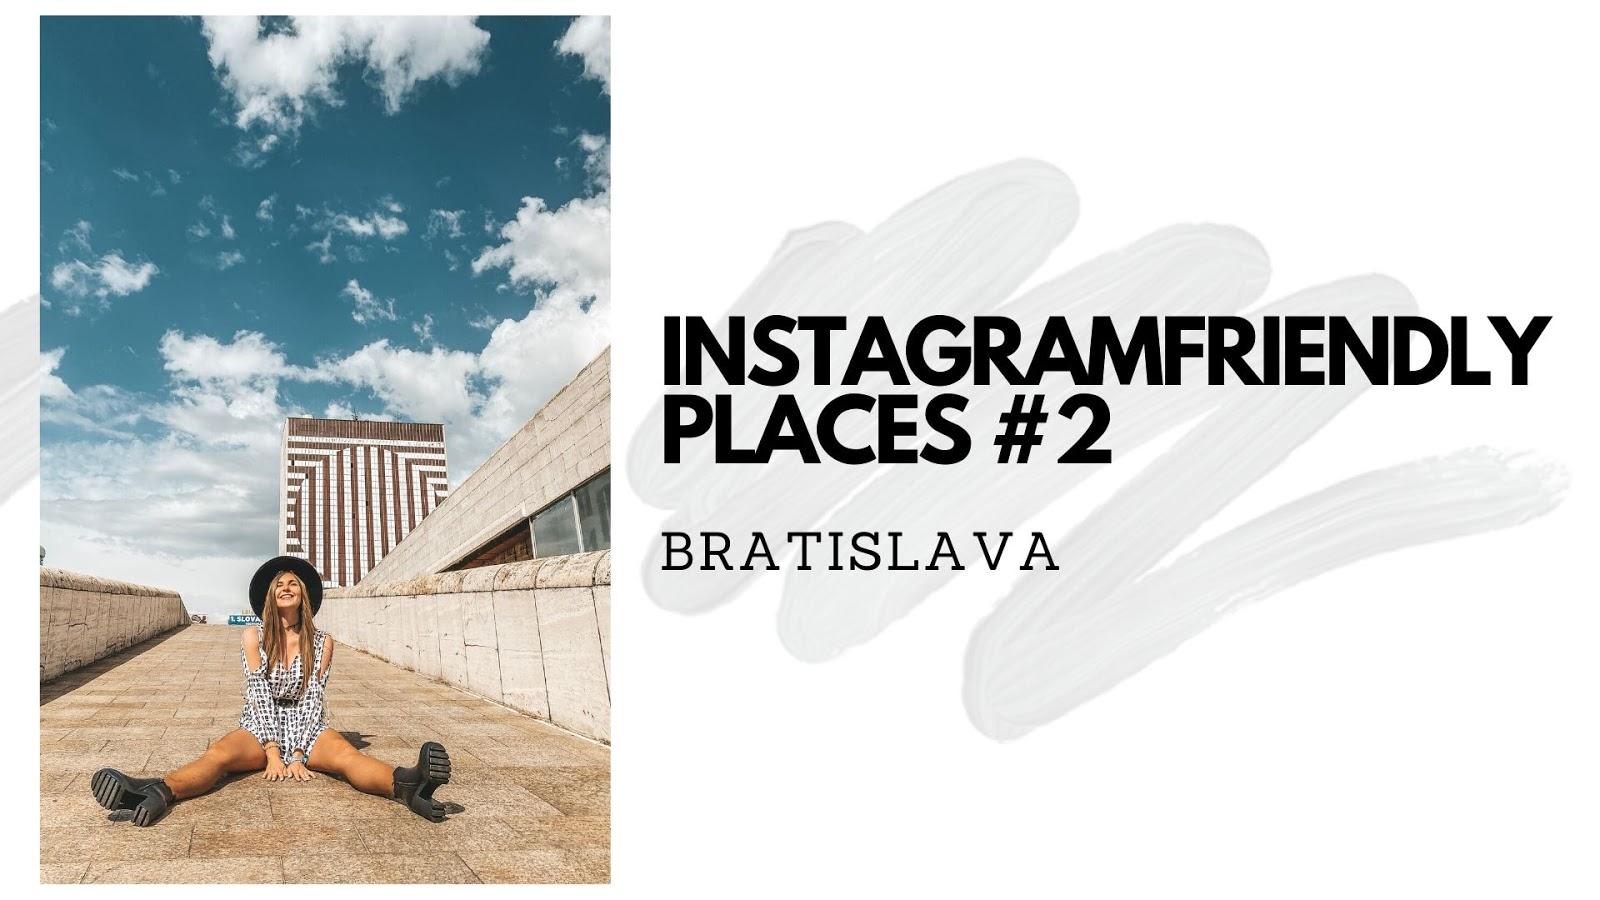 INSTAGRAMFRIENDLY PLACES IN BRATISLAVA #2